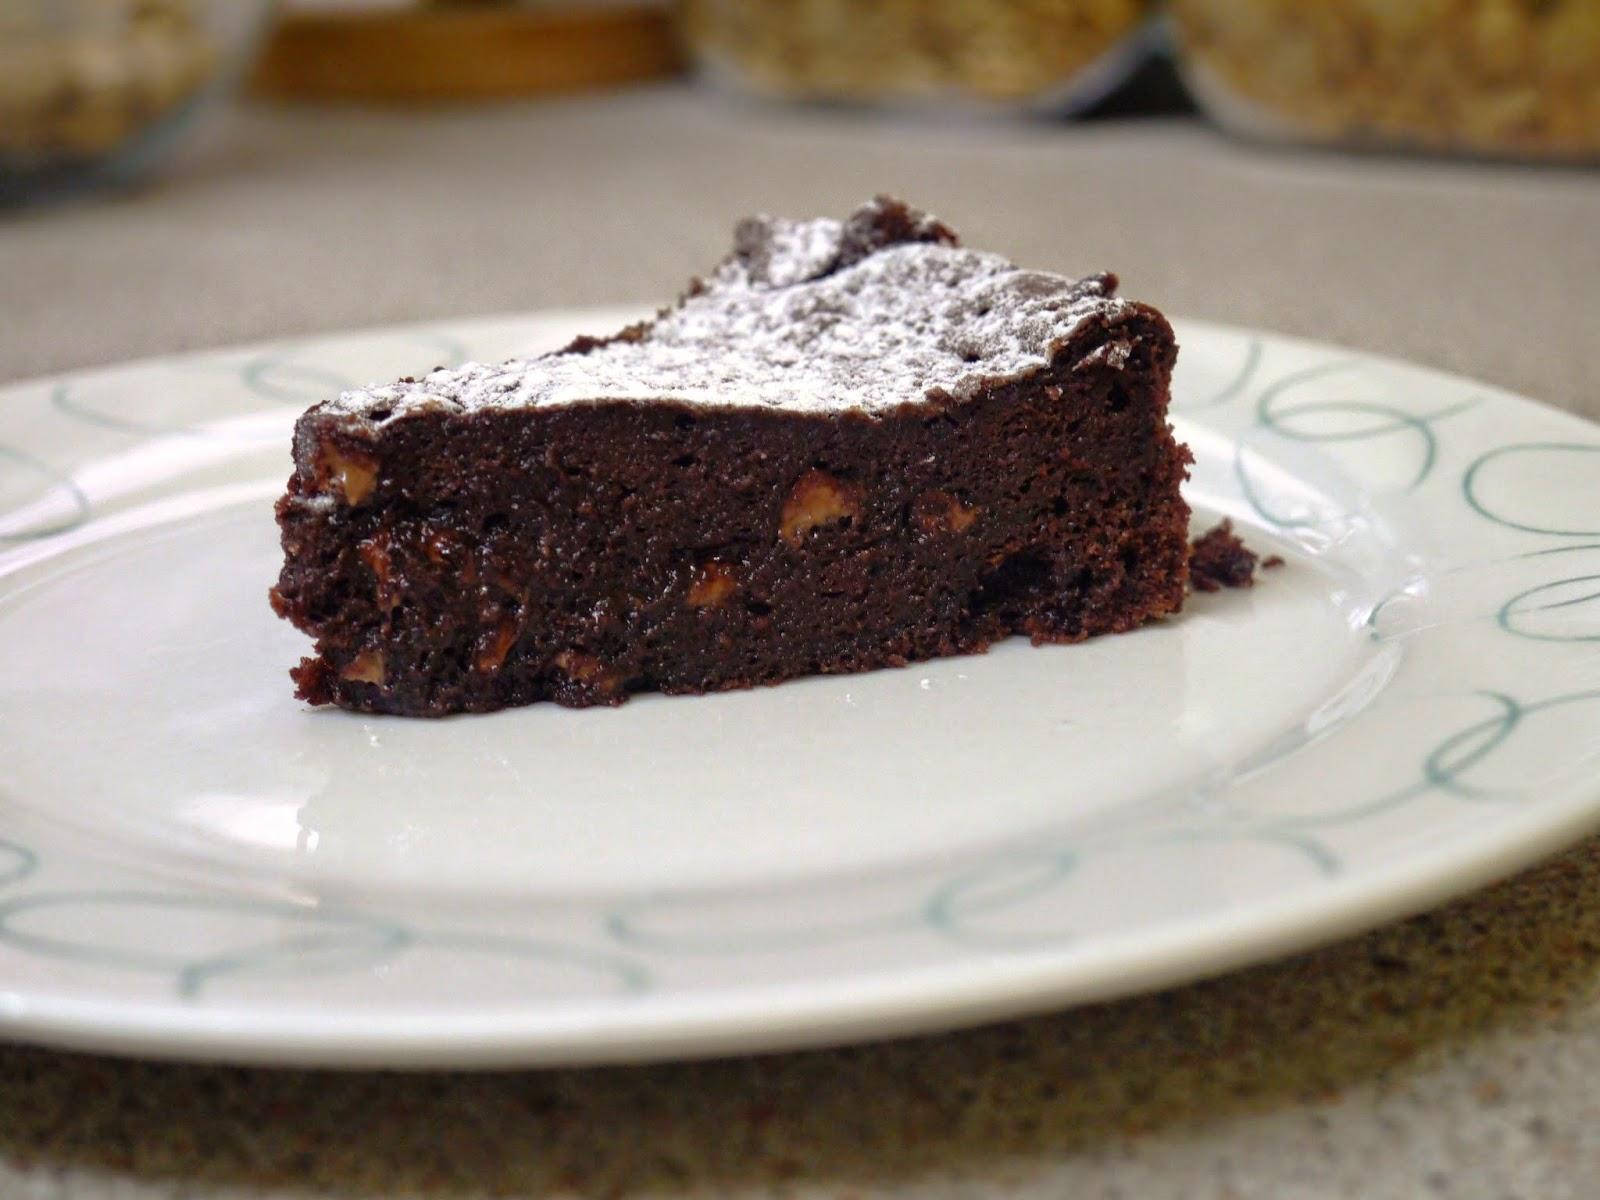 ... Muslim Girl Bakes: Double Chocolate Flourless Cake with Vanilla Cream